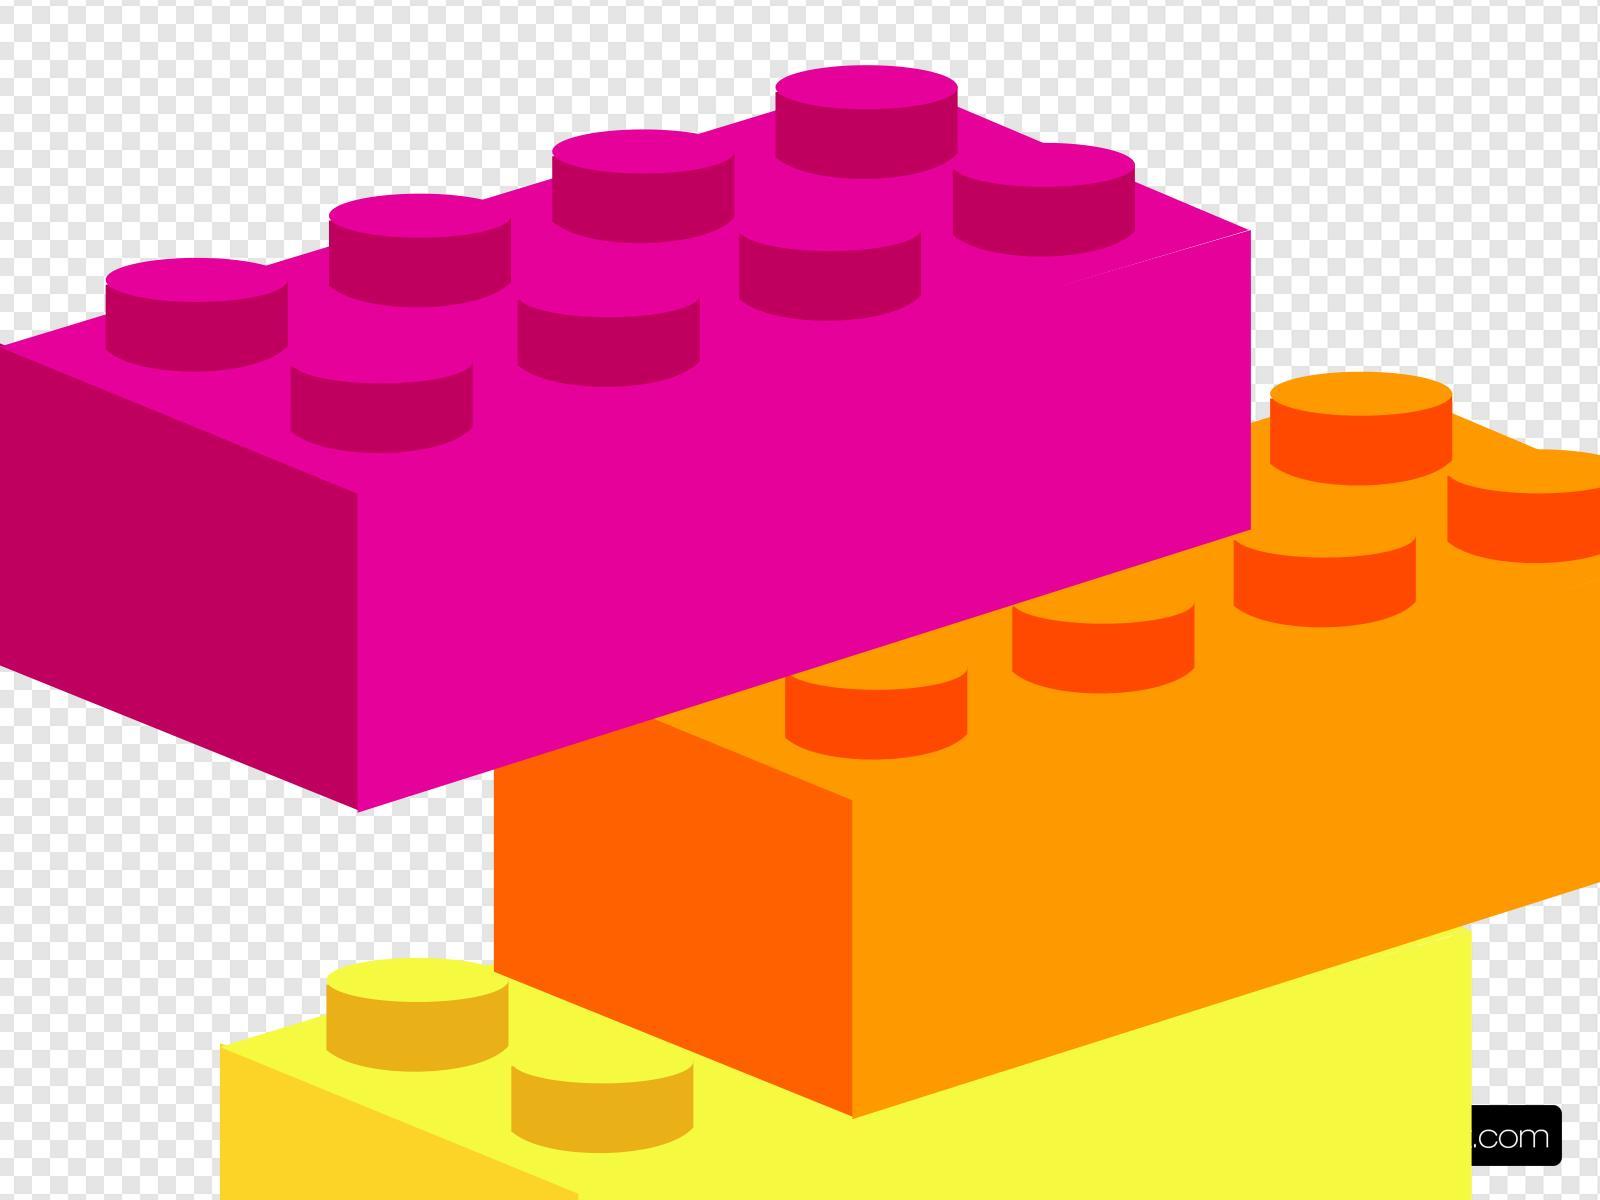 Lego clip art icon. Legos clipart pink clipart